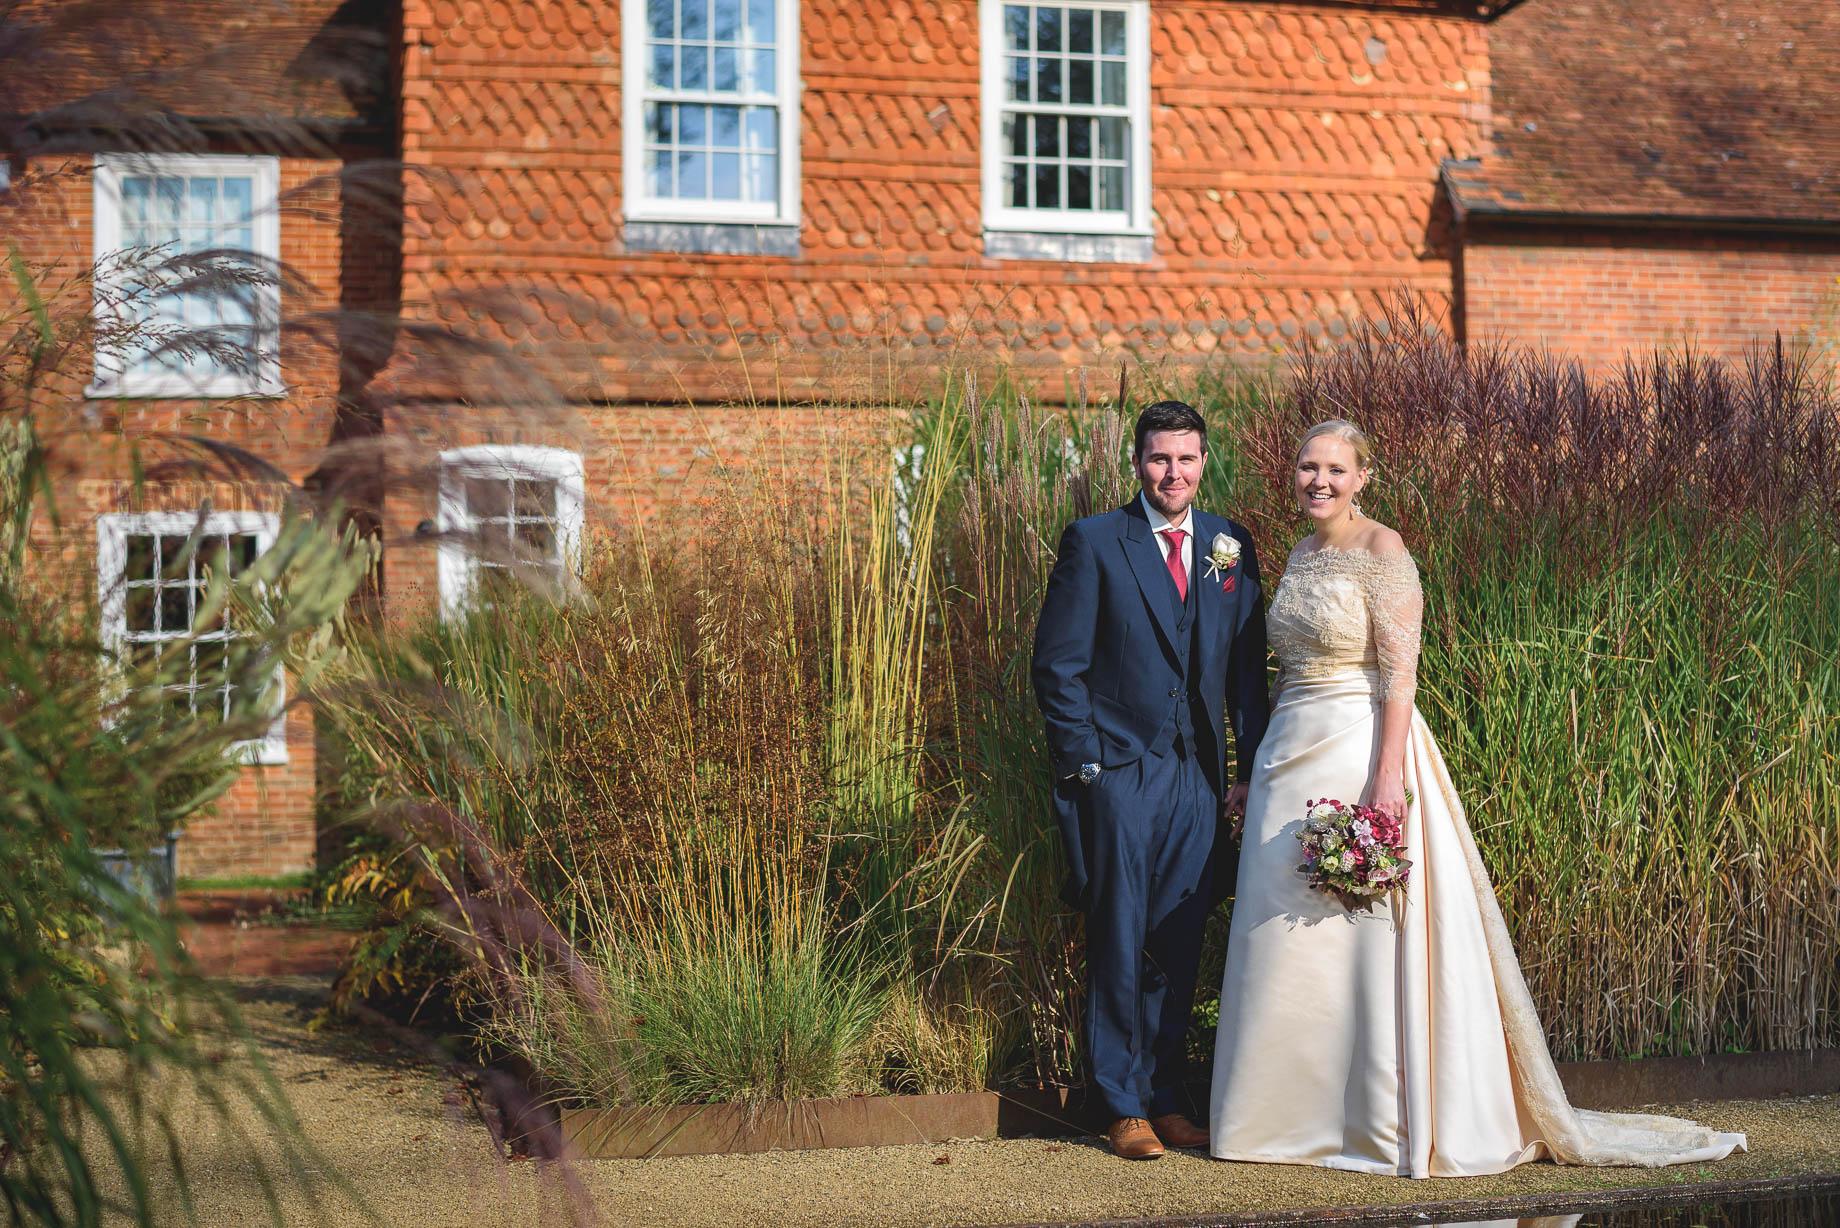 Bury Court Barn wedding photography - Guy Collier - Hannah and Mark (114 of 191)